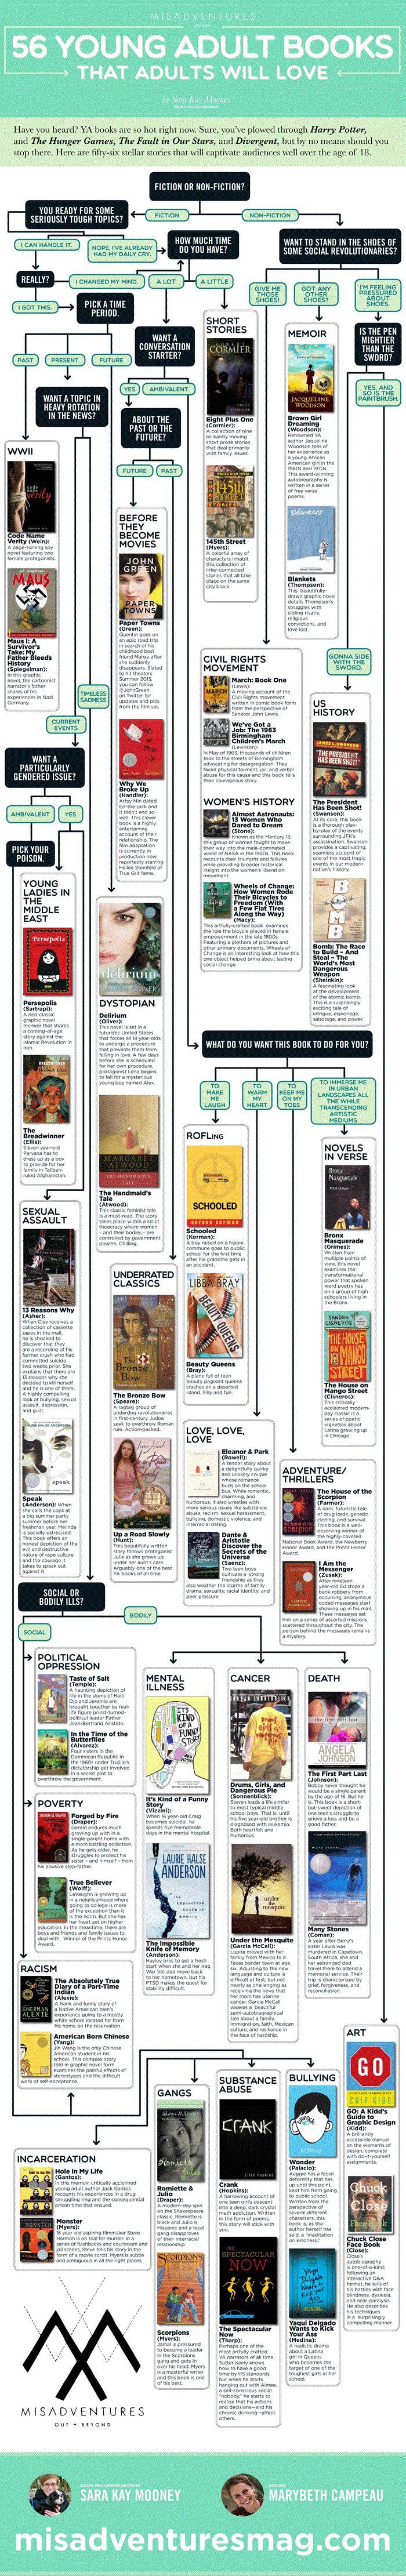 56 YA Books Info (GalleyCat)